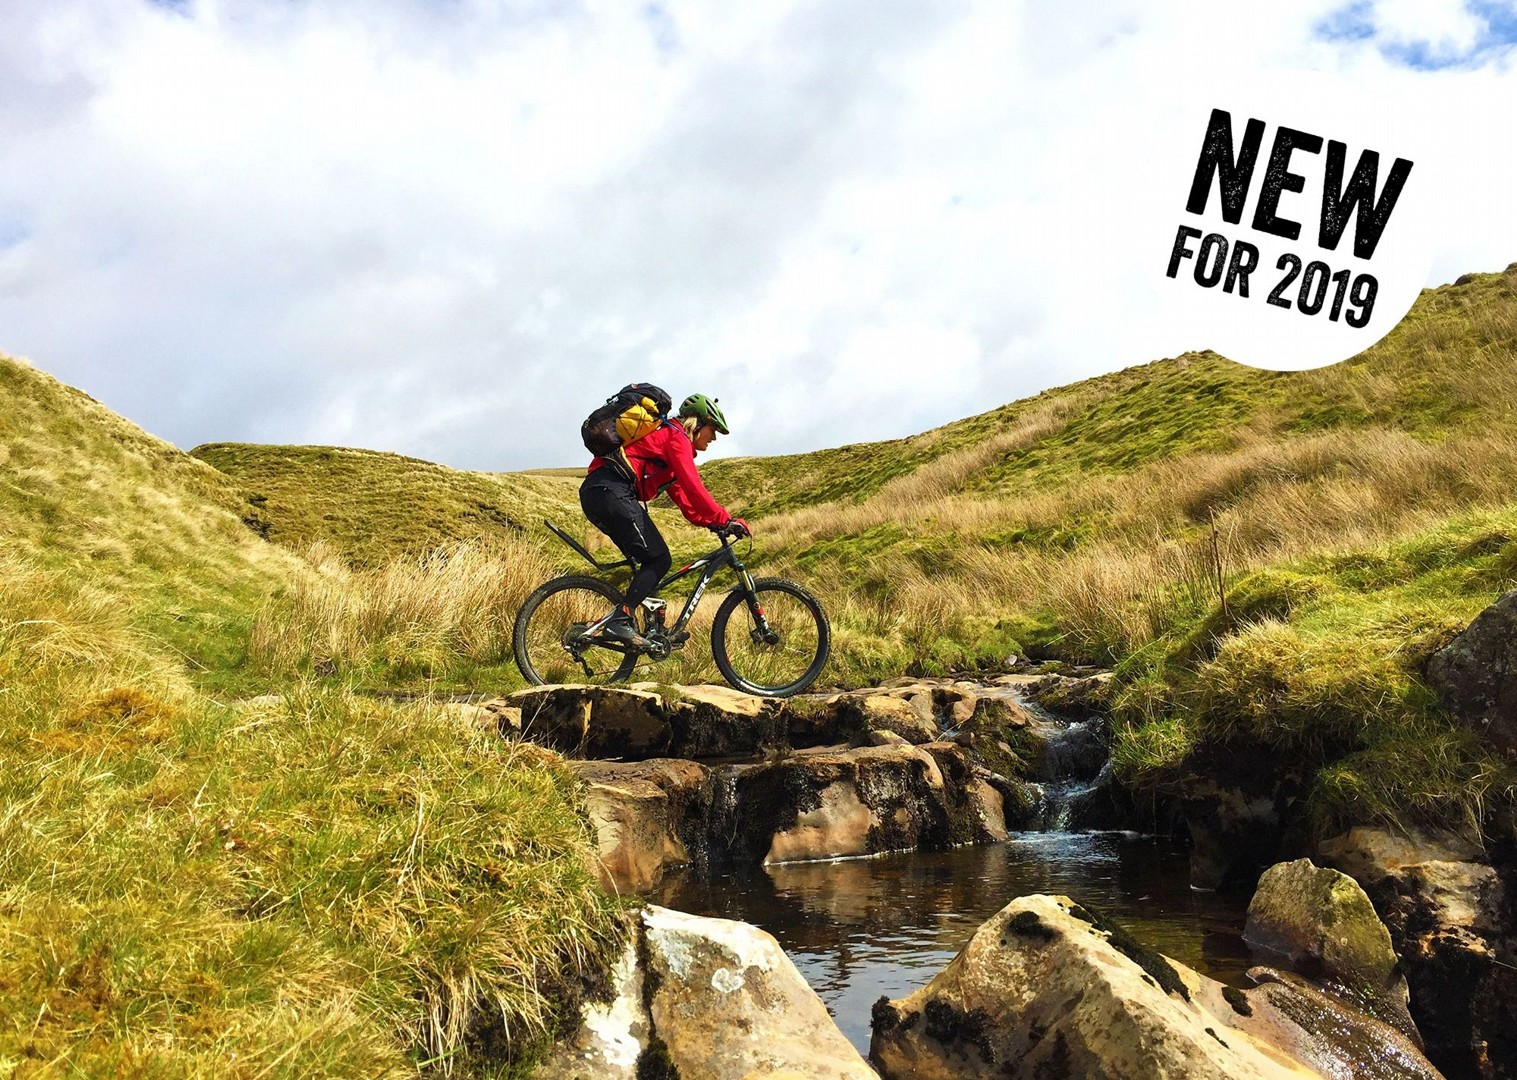 uk-pennine-bridleway-guided-mountain-bike-weekend.jpg - UK - Pennine Bridleway - Guided Mountain Bike Weekend - Mountain Biking